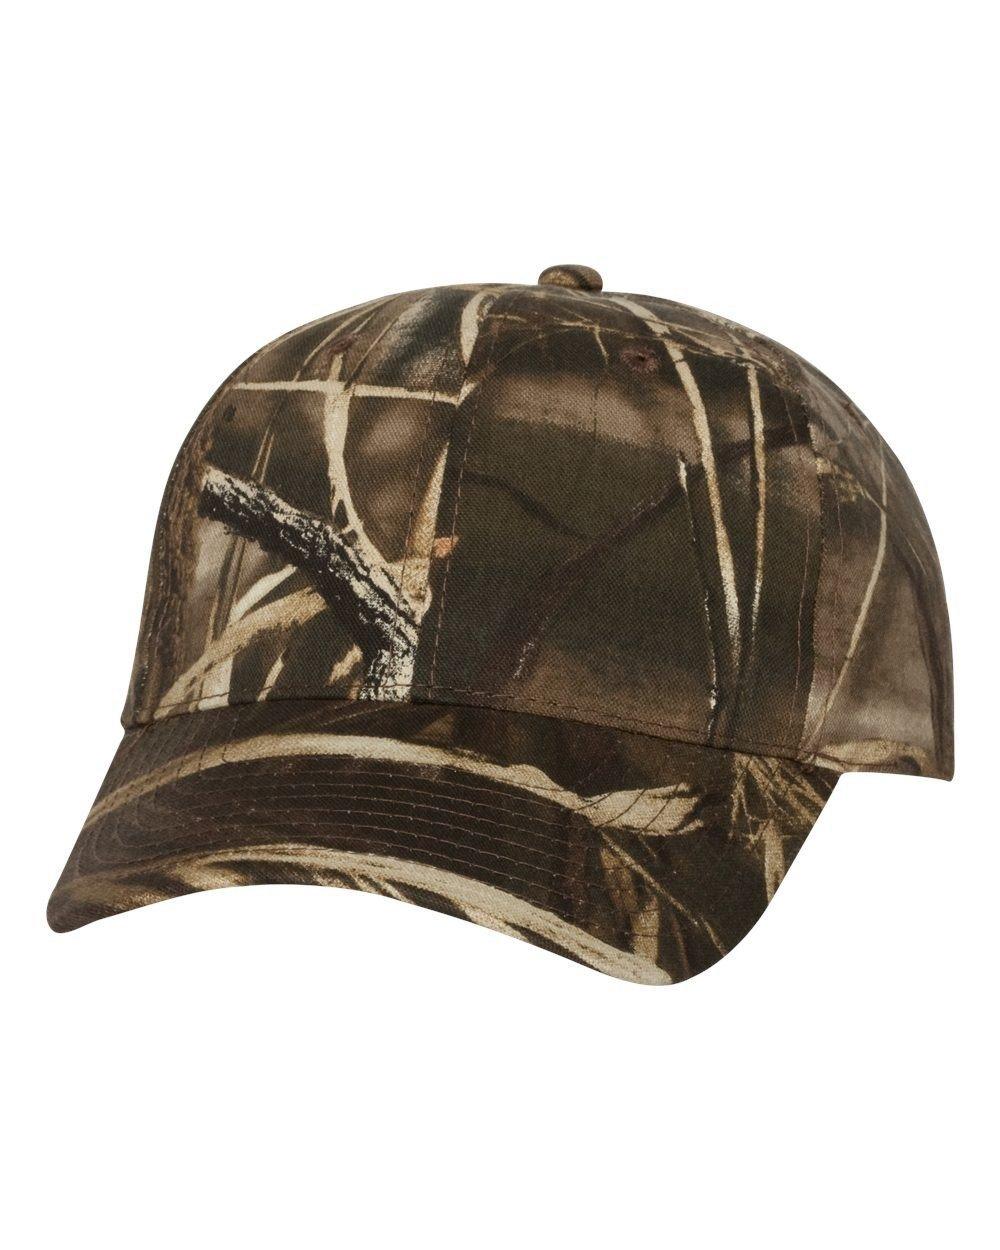 18d85efdf3aac Amazon.com  Outdoor Cap Classic Twill Realtree Max-4 Camo Hat  Sports    Outdoors